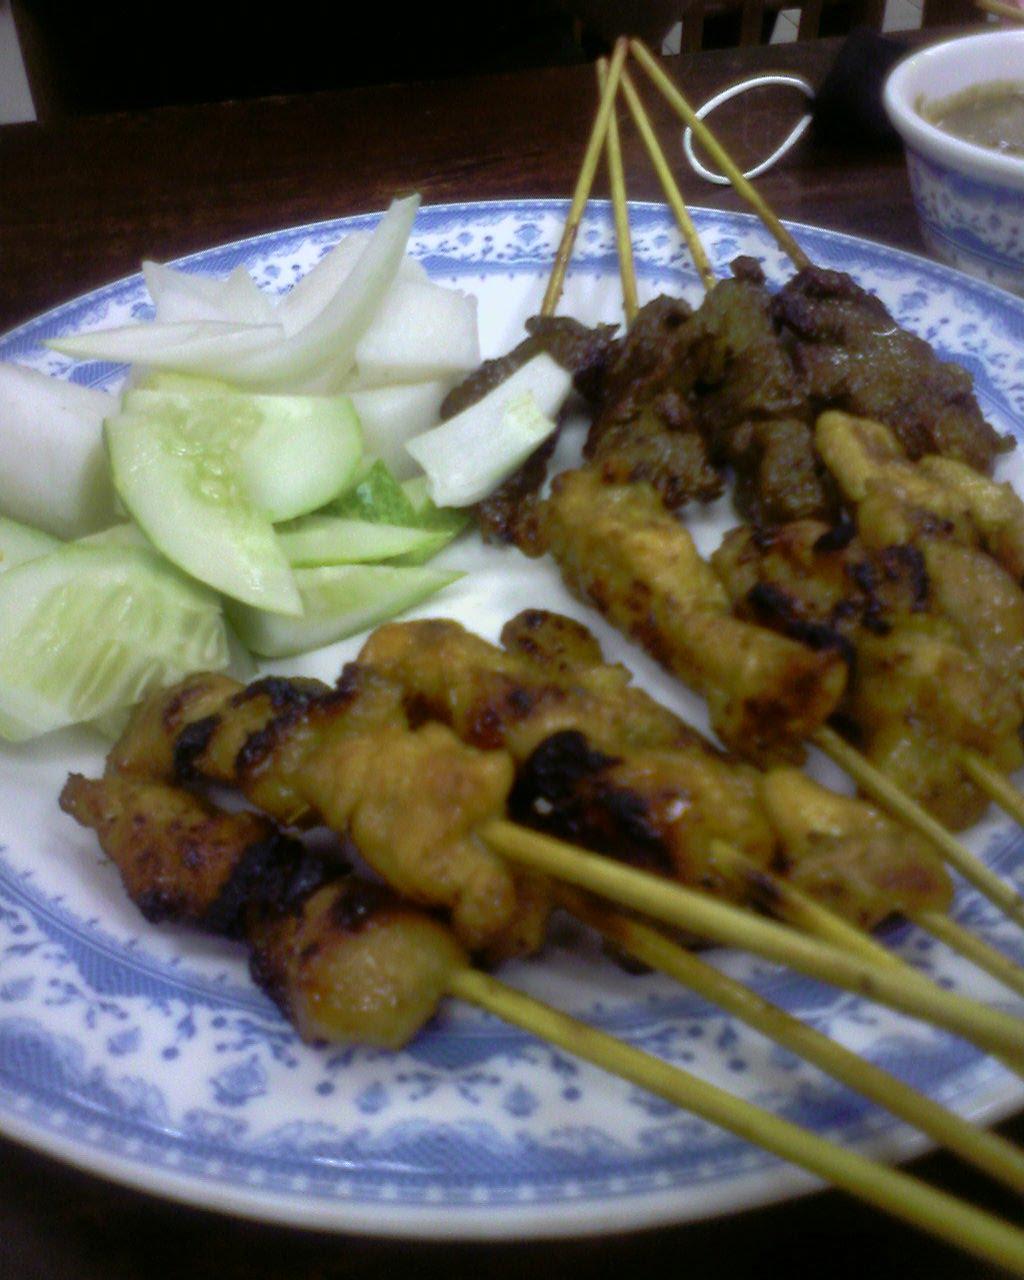 satay a taste of malaysias national snack Satay station: pure taste of malaysian food - see 8 traveler reviews, 2 candid photos, and great deals for kuala lumpur, malaysia, at tripadvisor.